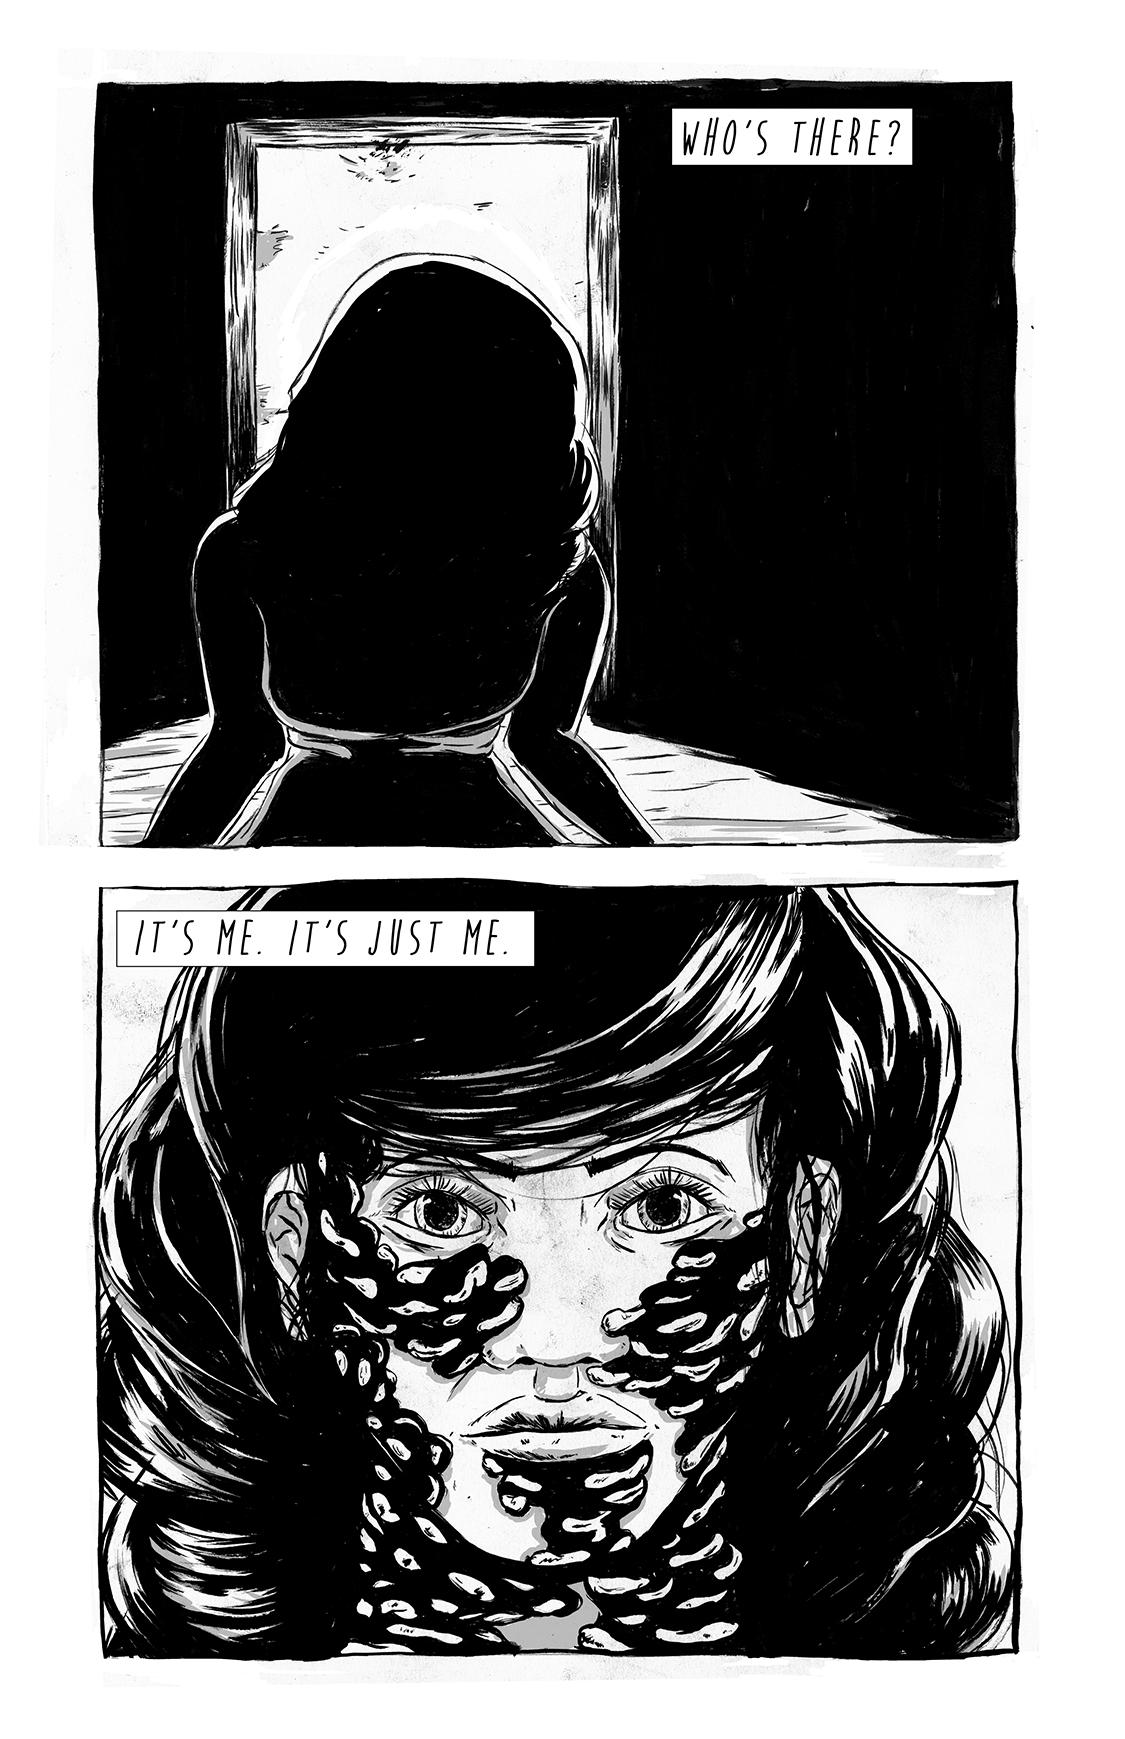 Eight Days Alone, page 15, by Sam Costello and Matthew Goik